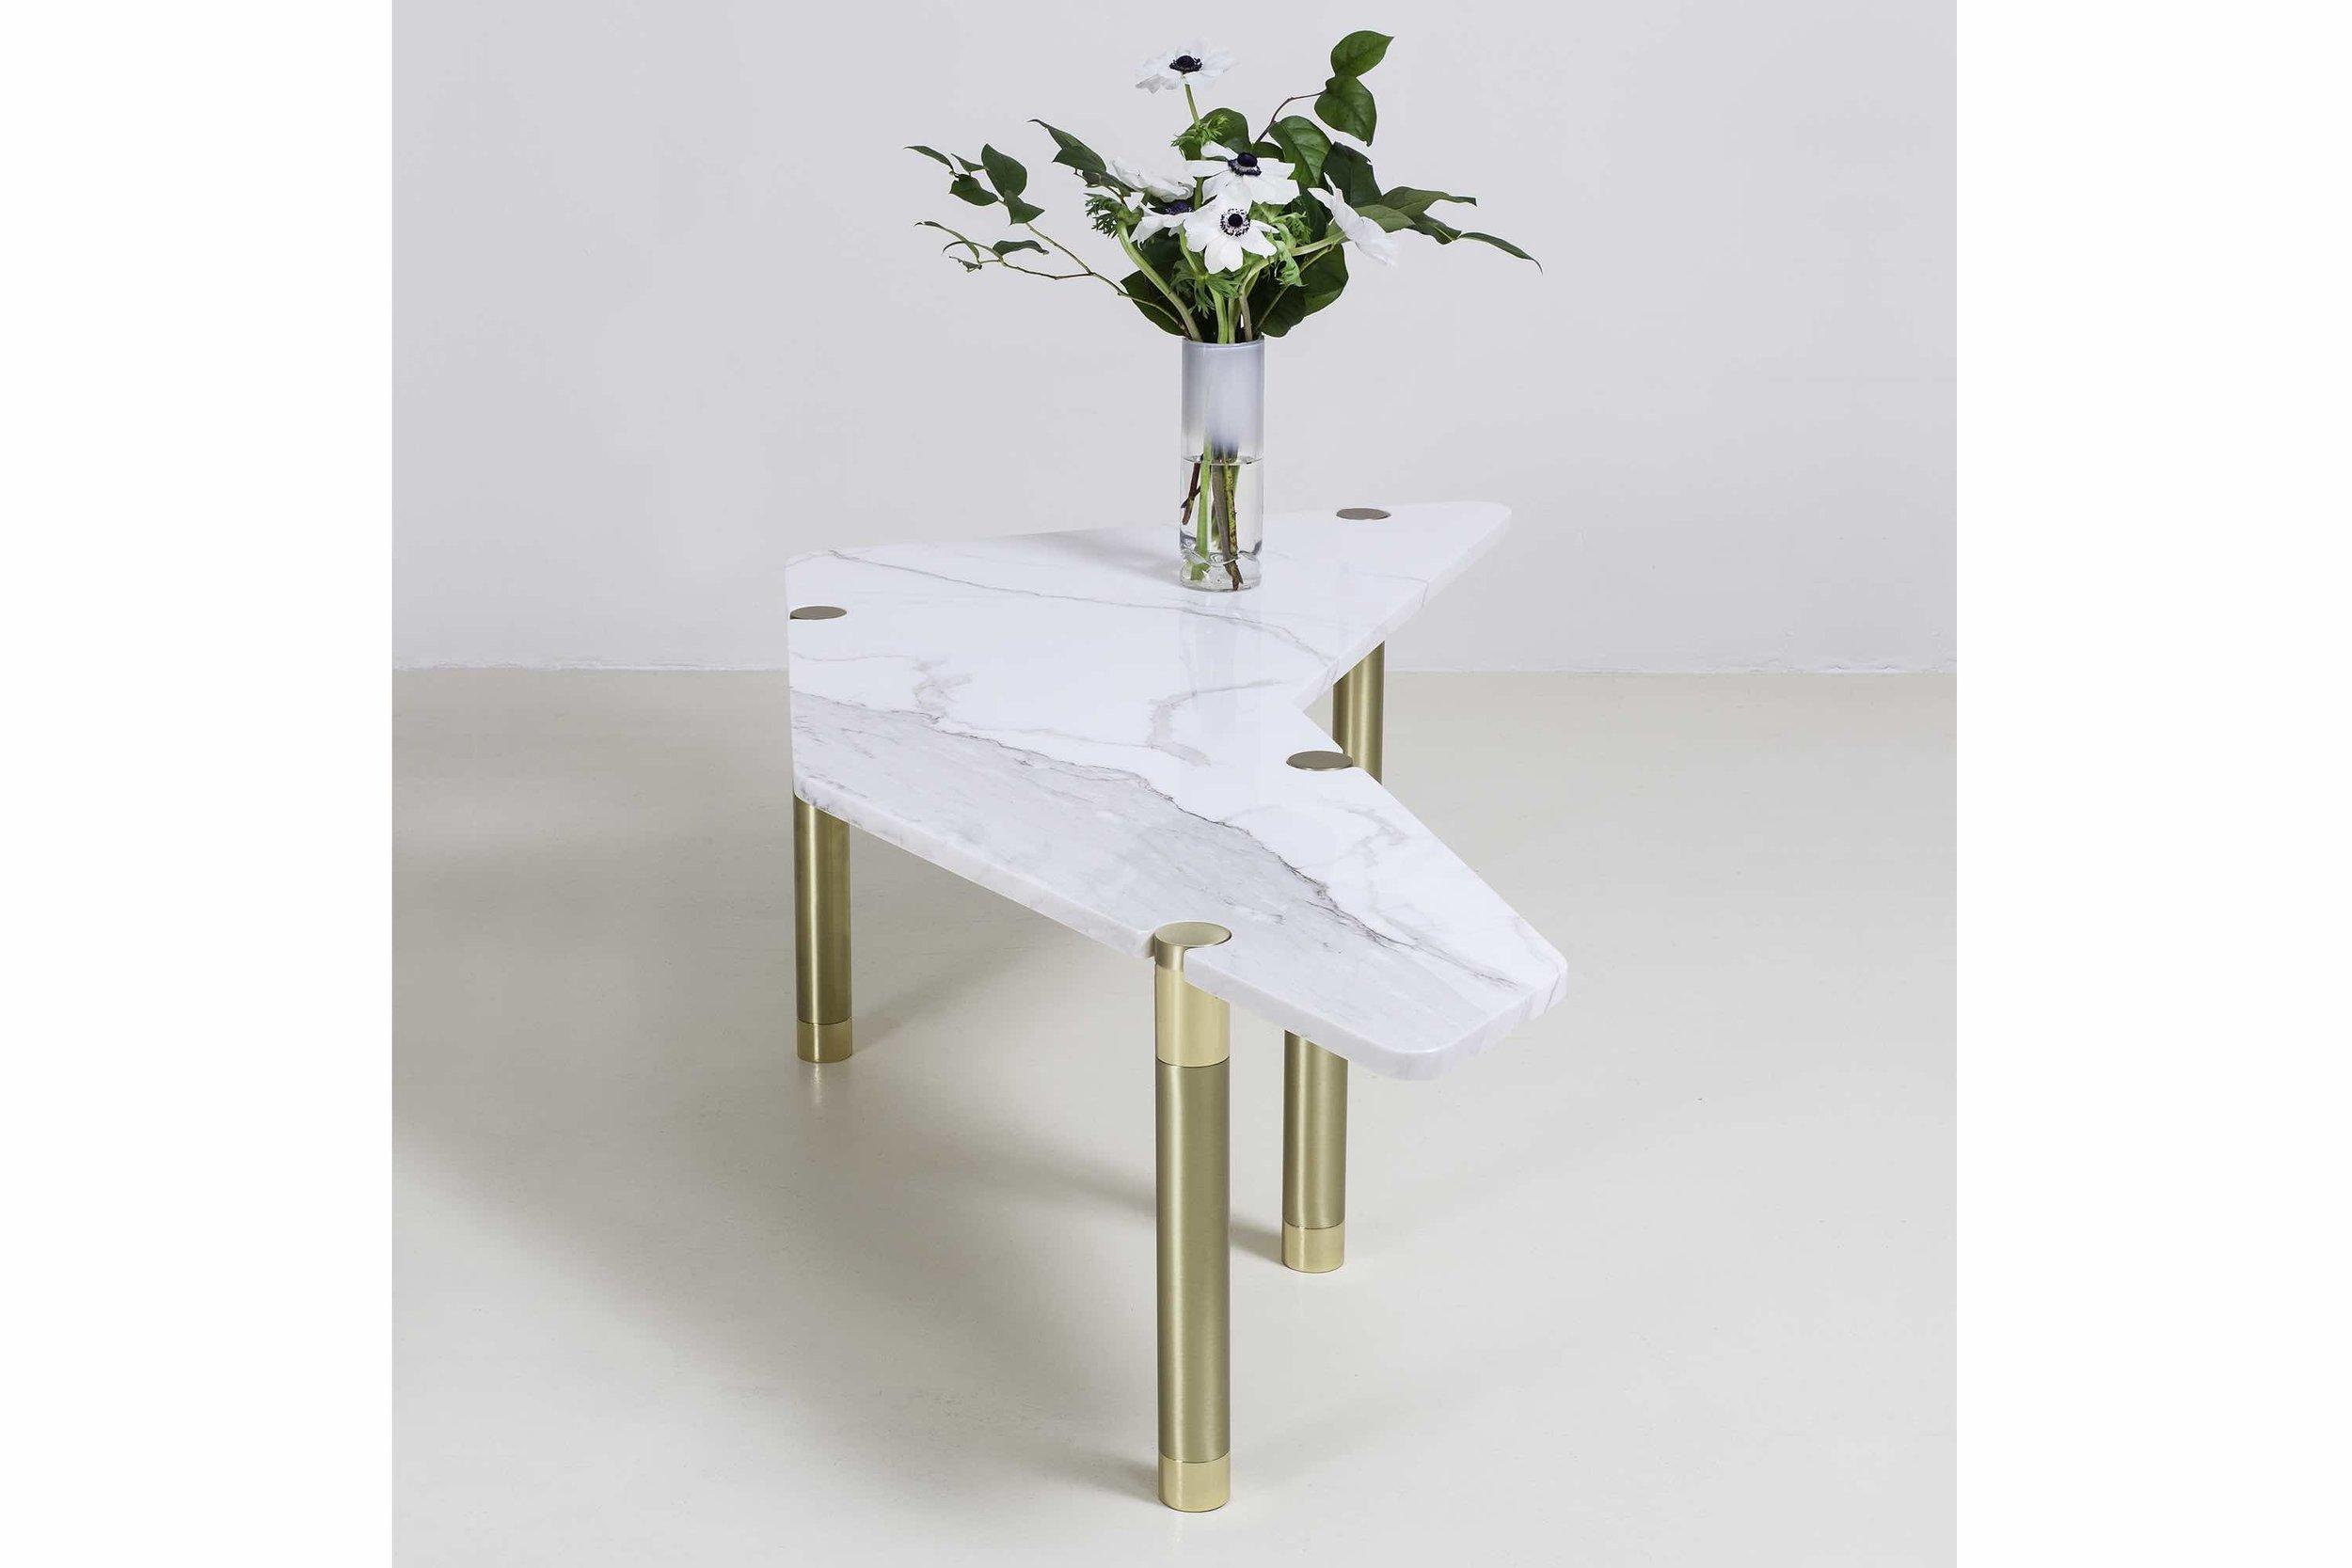 Avram_Rusu_Nova_Boomerang_Coffee_Table_5.jpeg